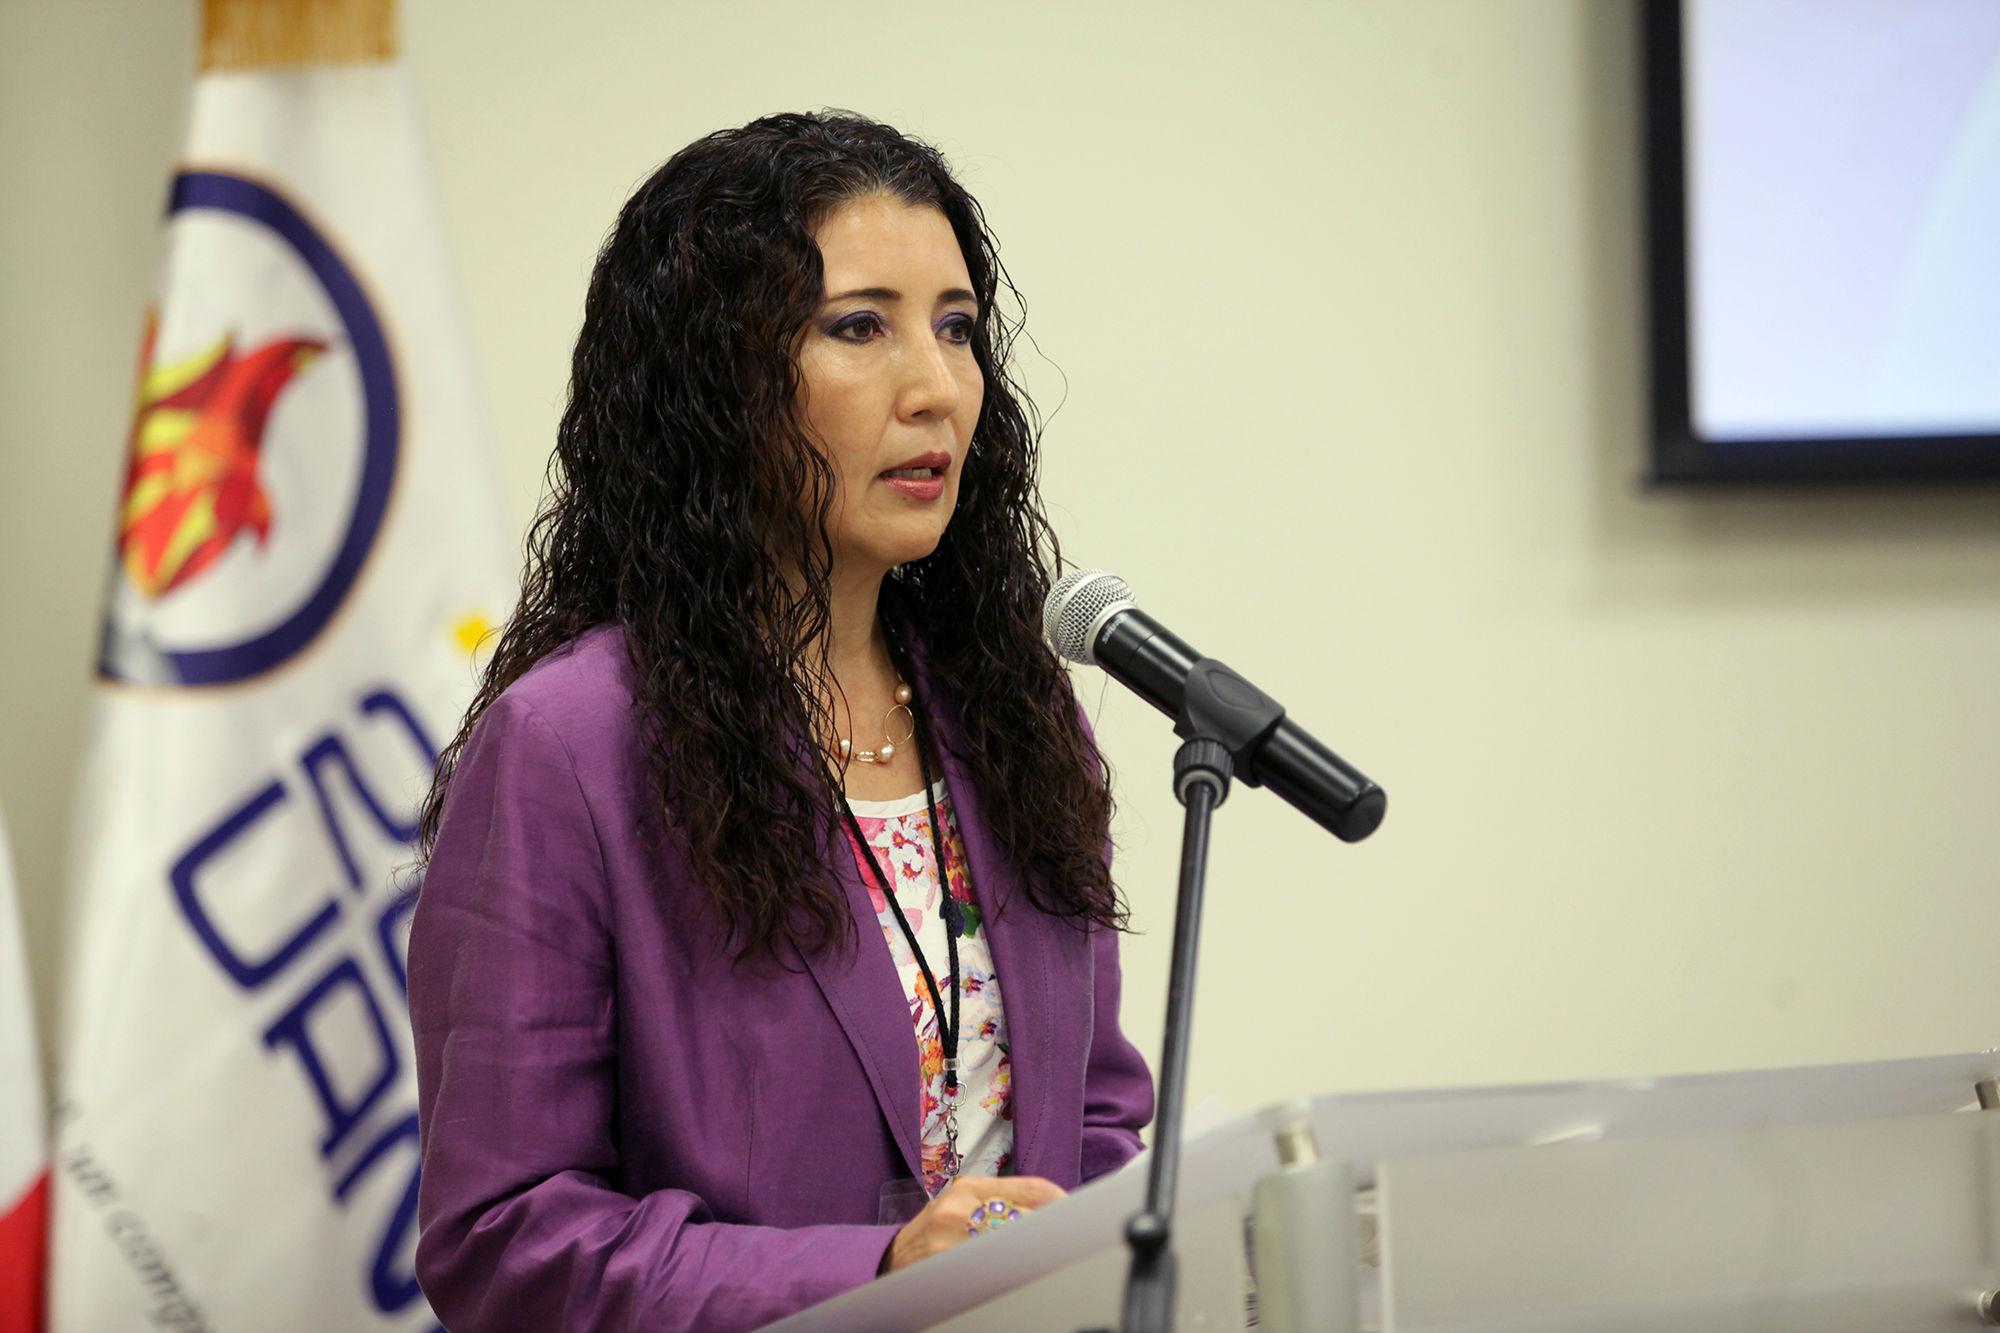 Dra. Luz Natalia Berrún Castañón